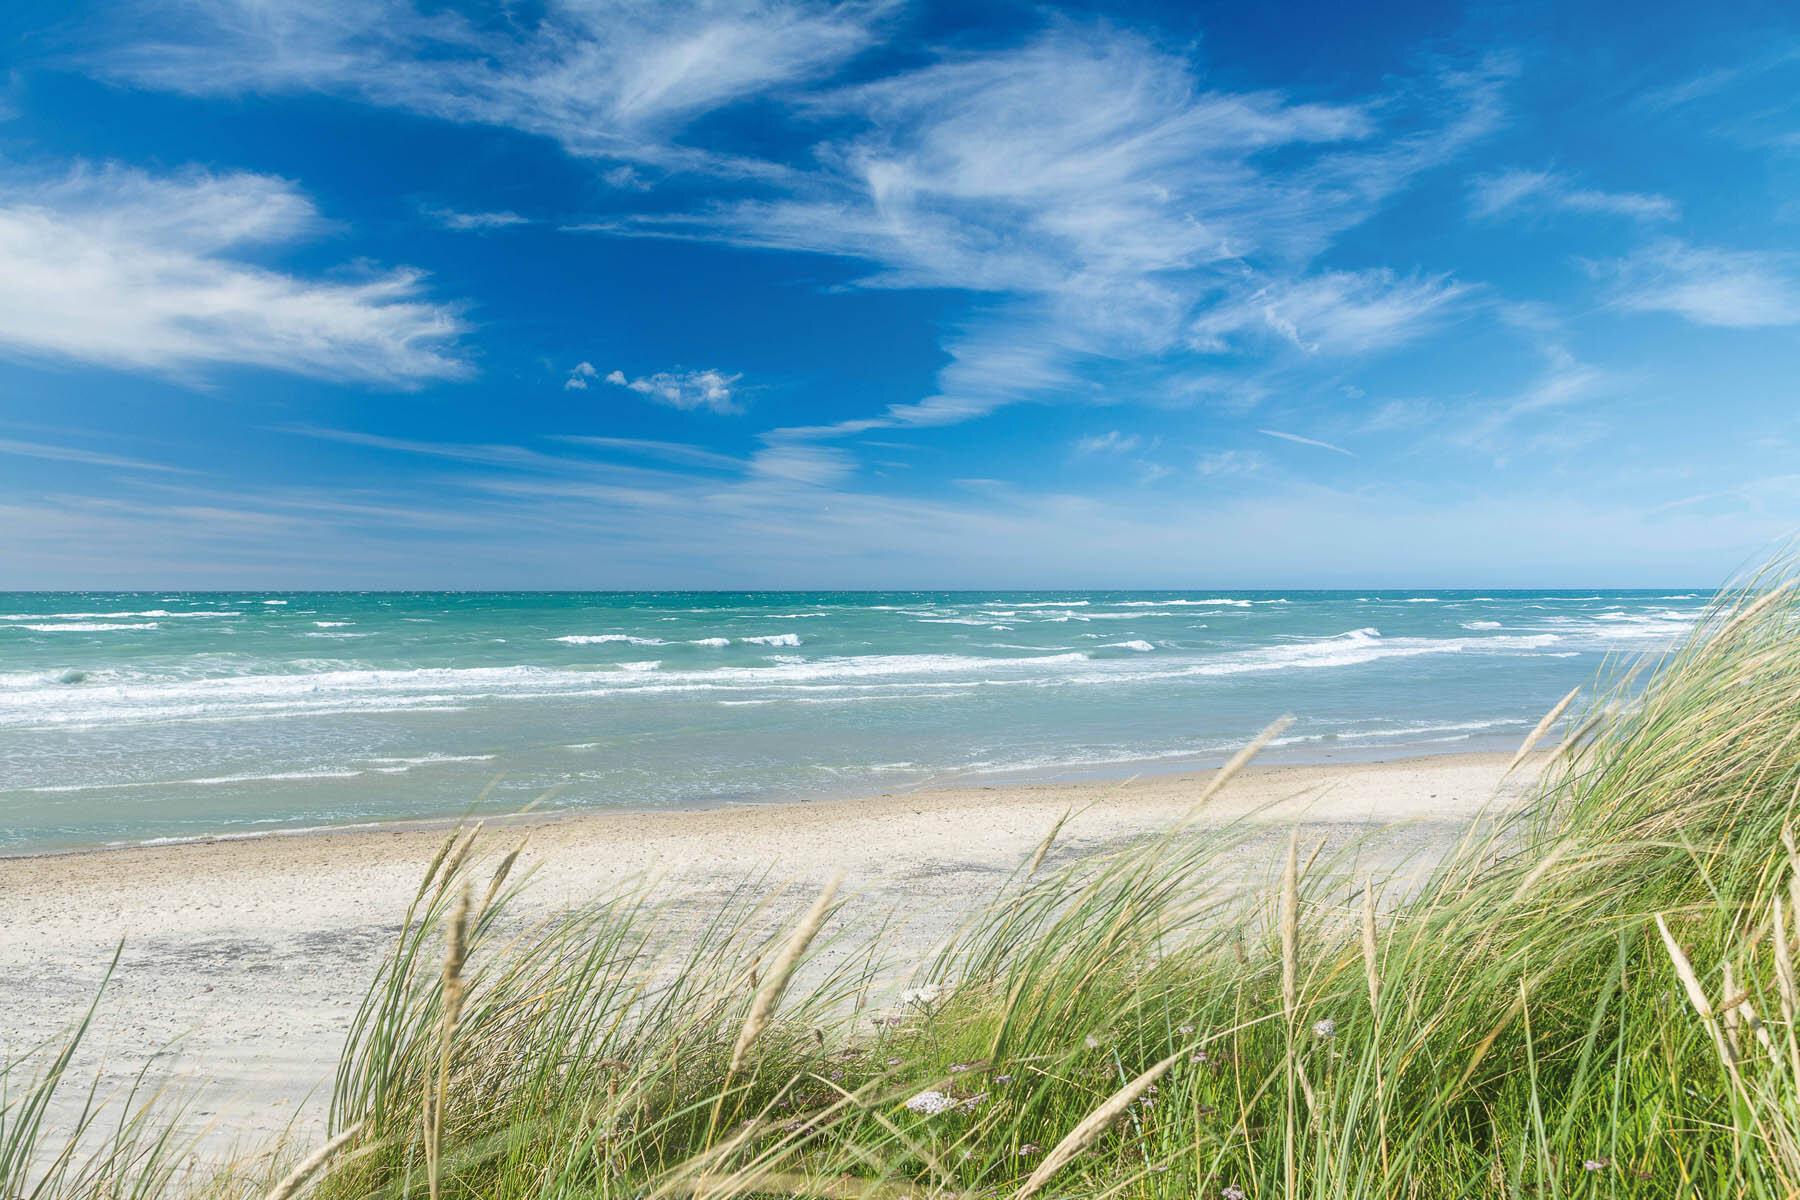 Dusche PlateART Duschrückwand mit Motiv Strand und Meer